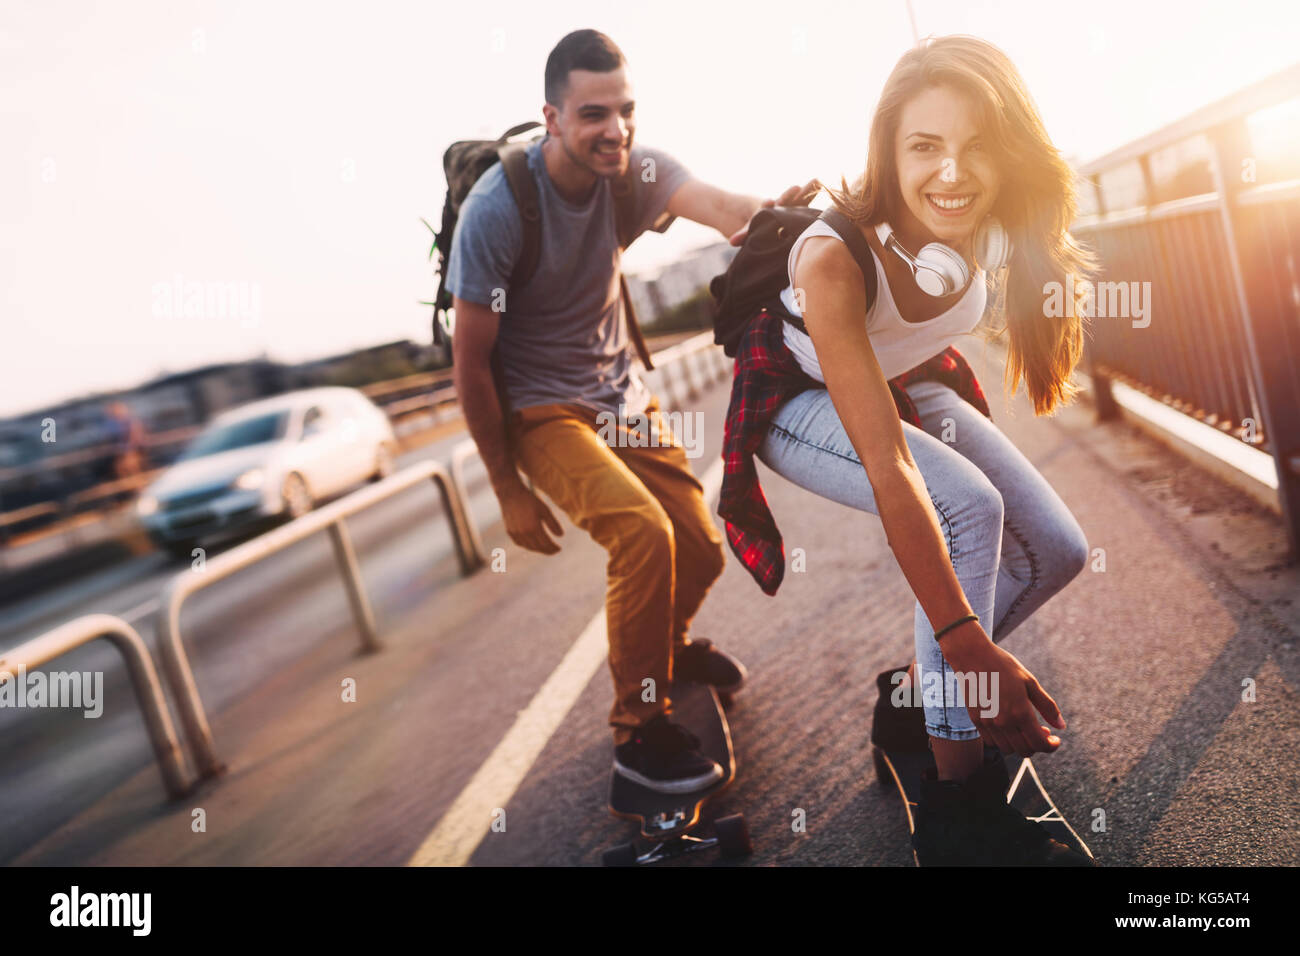 Joven pareja atractiva caballo skateboards y divertirse Imagen De Stock